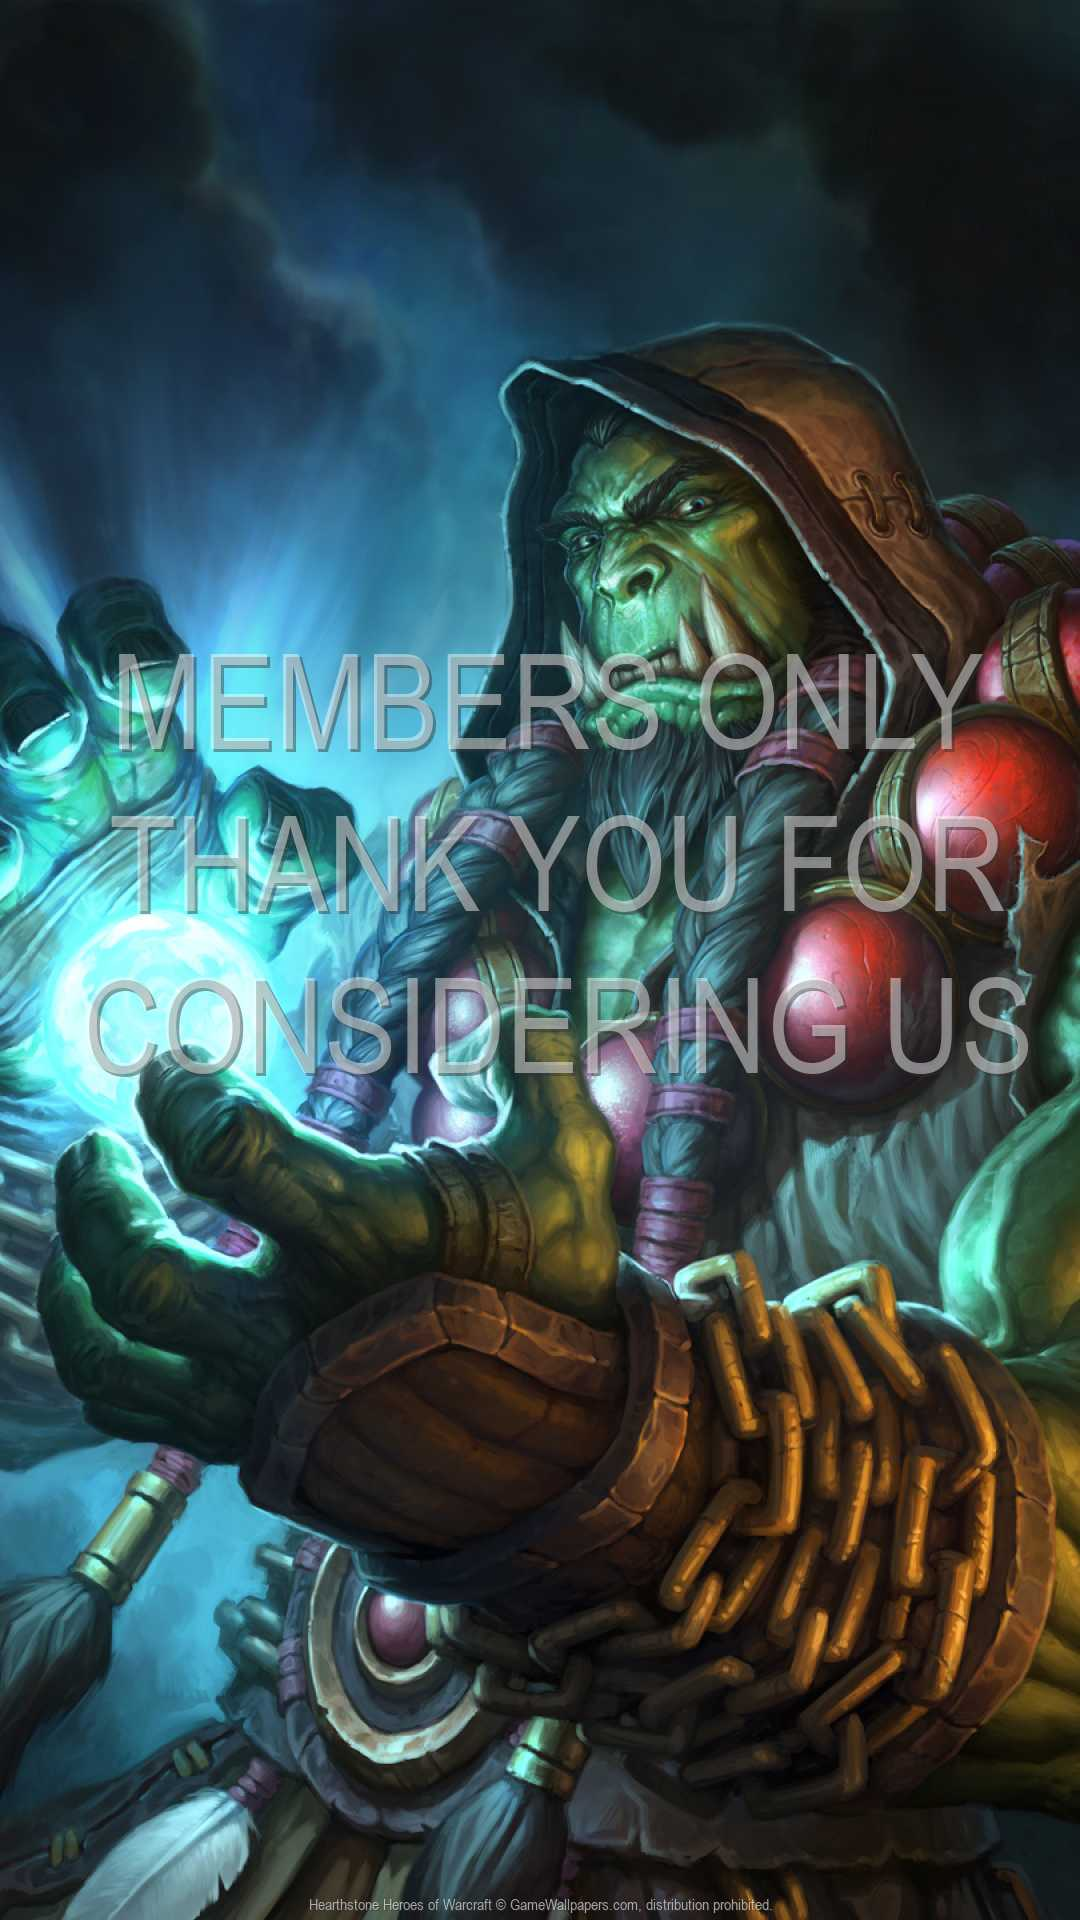 Hearthstone: Heroes of Warcraft 1080p Vertical Handy Hintergrundbild 02